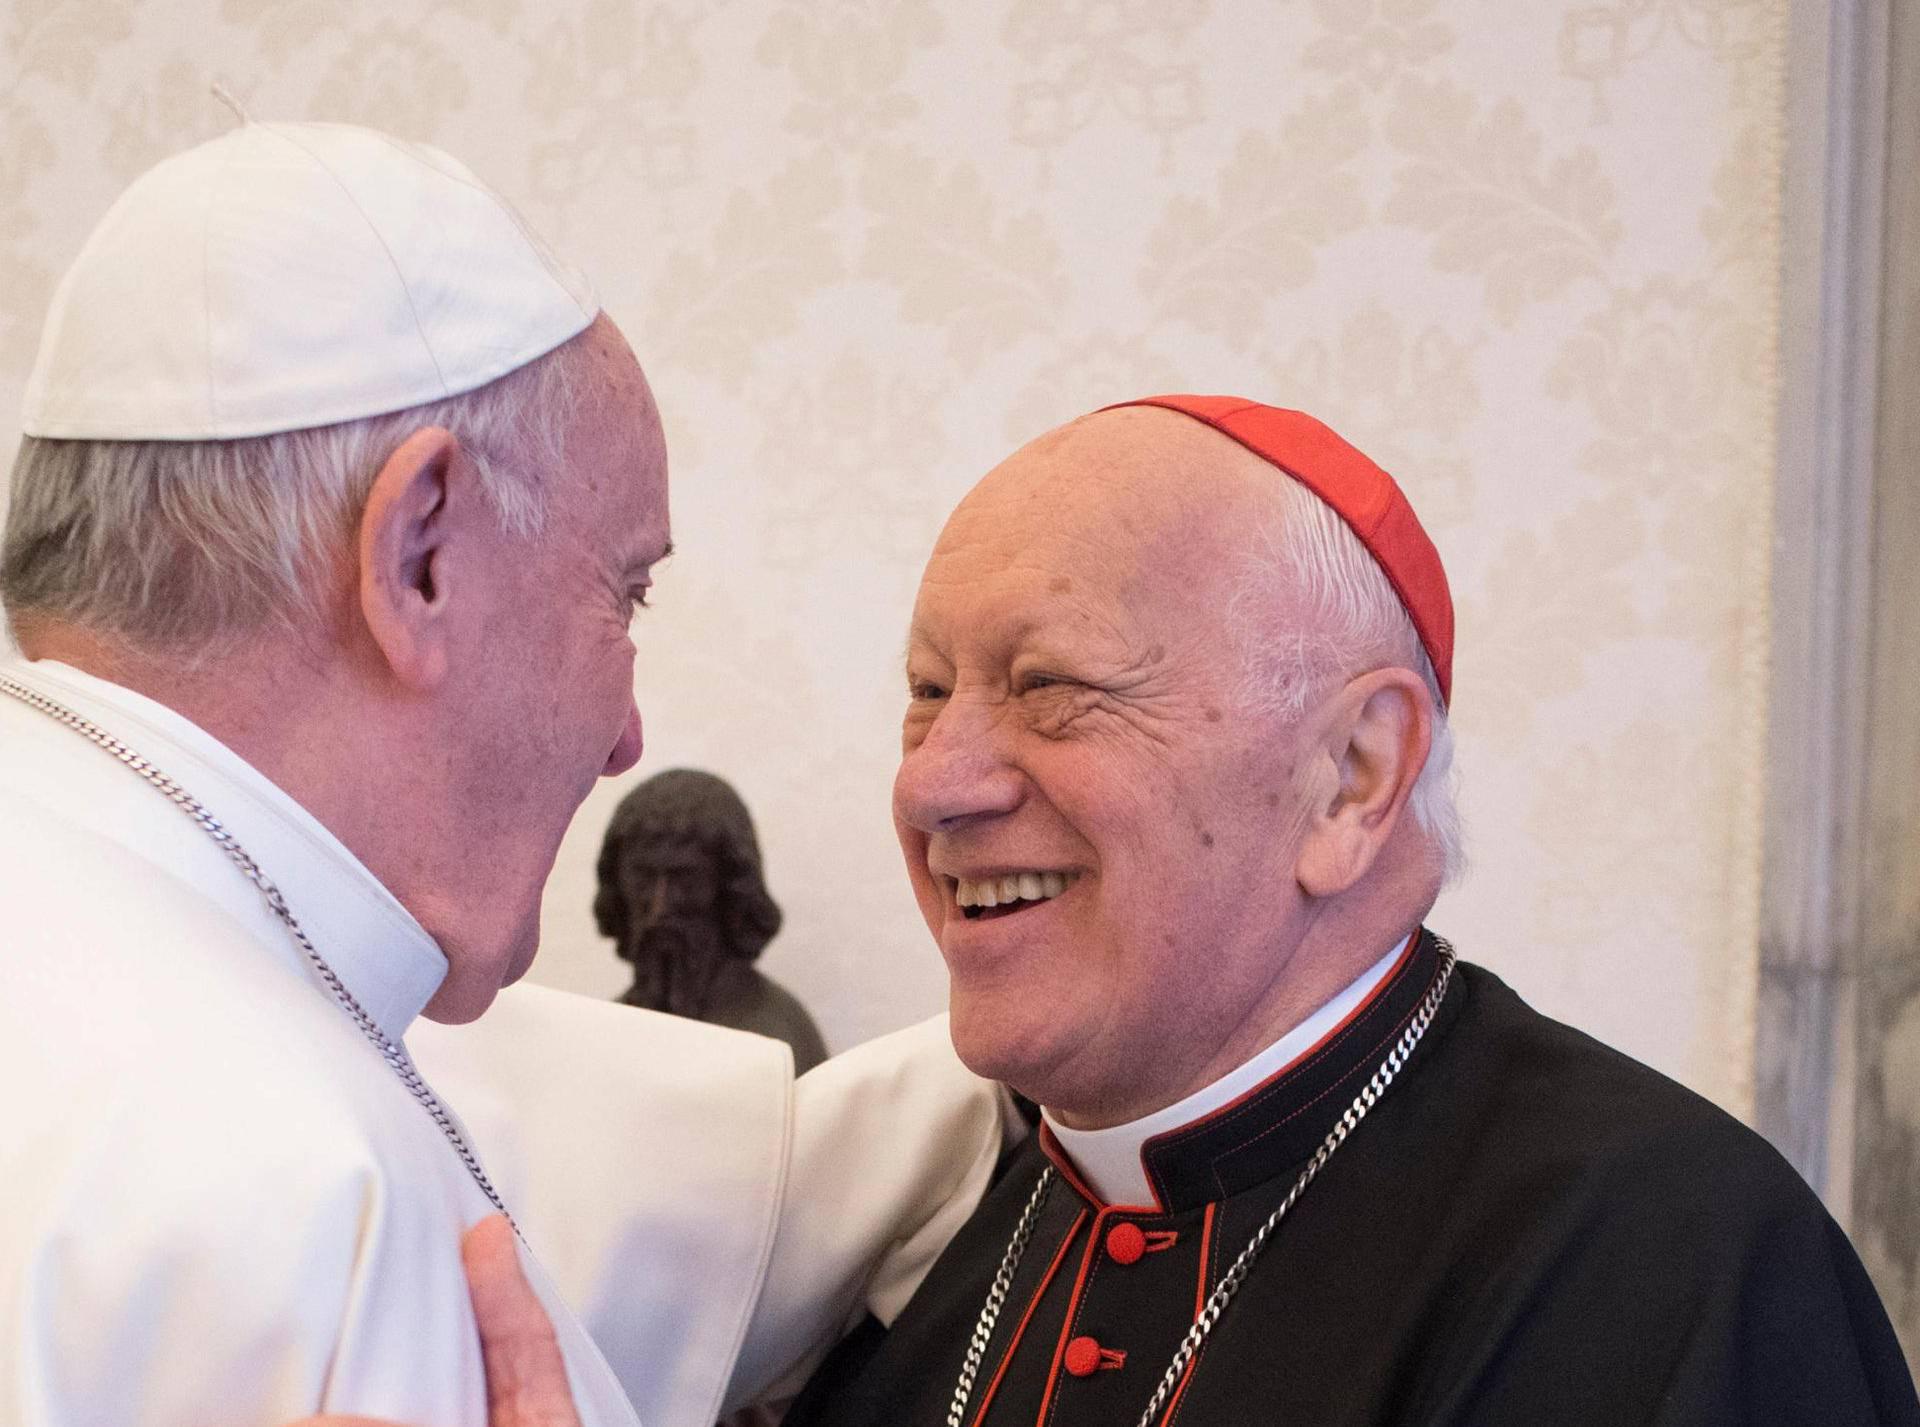 Pope Francis receives archbishop of Santiago de Chile, Ricardo Ezzati Andrello at the Vatican